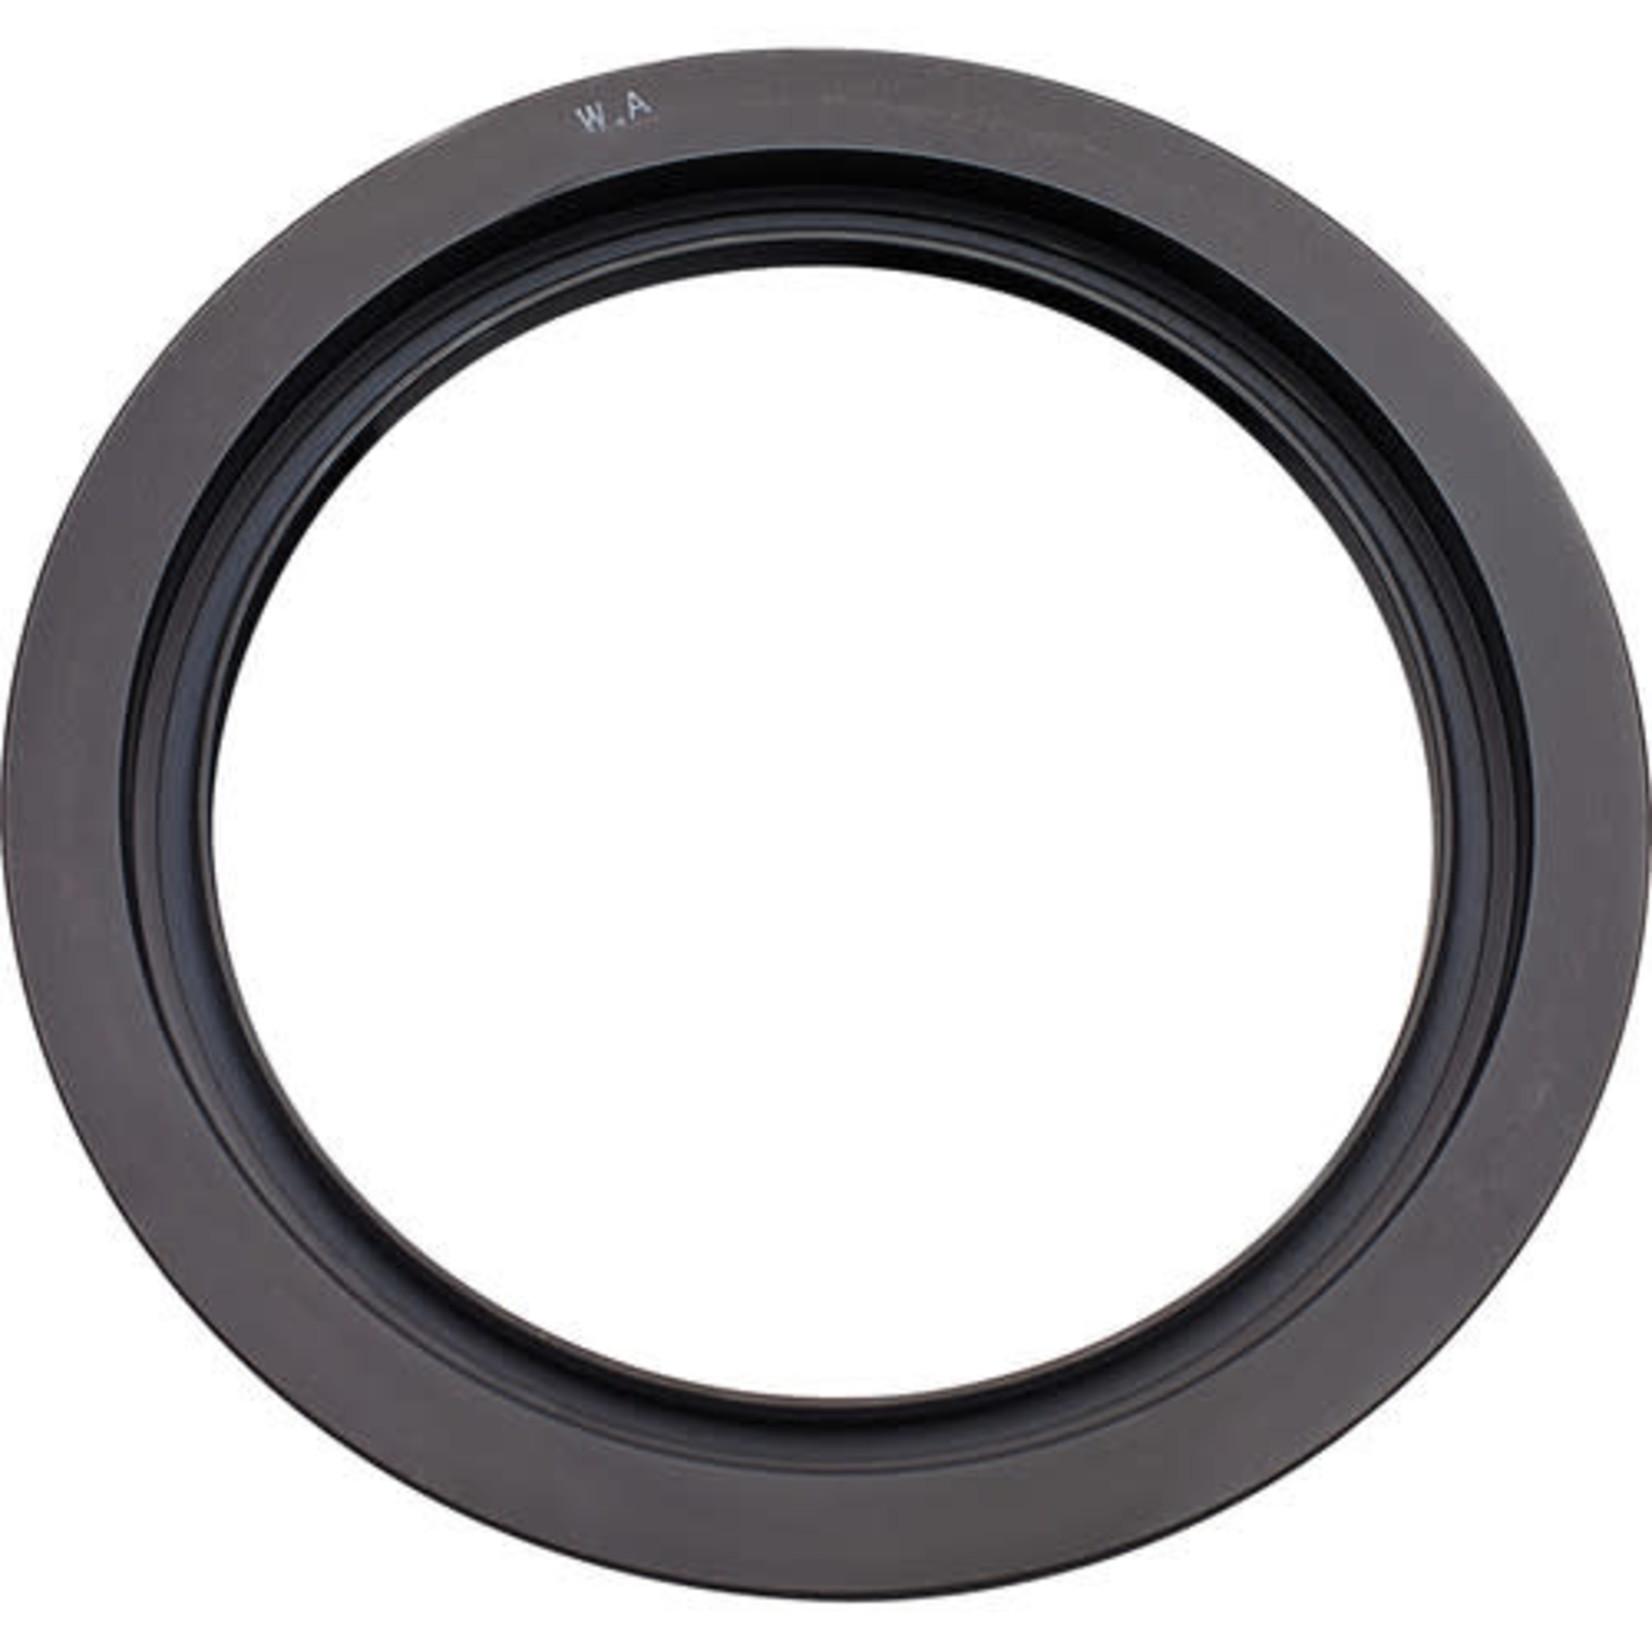 Lee LEE Filters 62mm Wide-Angle Lens Adapter Ring for 100mm System Filter Holder